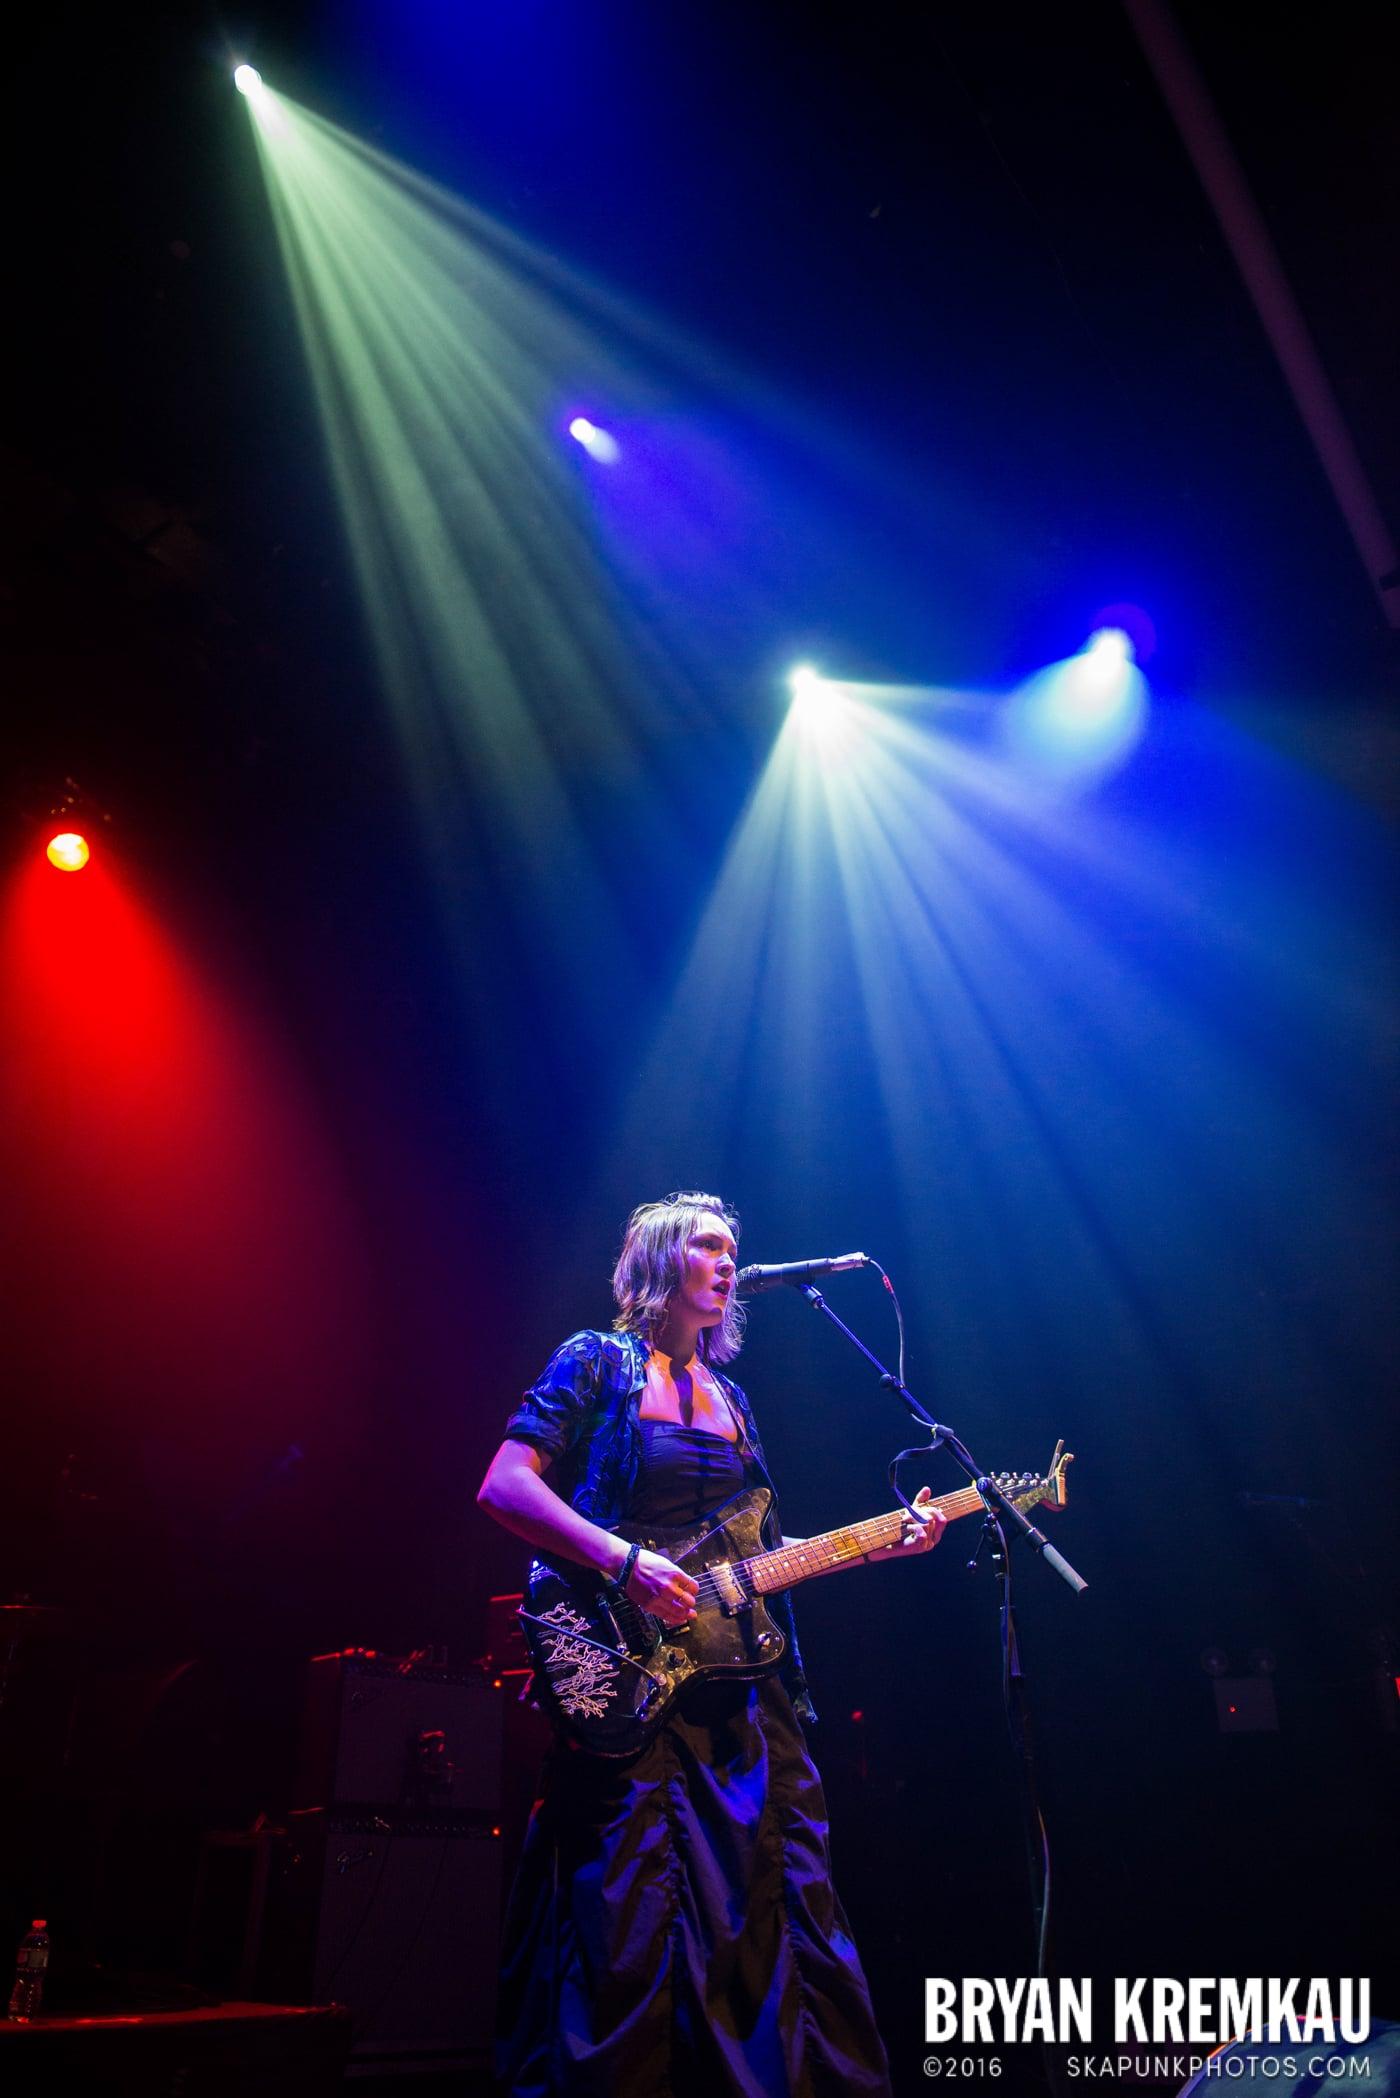 Meredith Sheldon @ Gramercy Theatre, NYC - 11.12.14 (10)